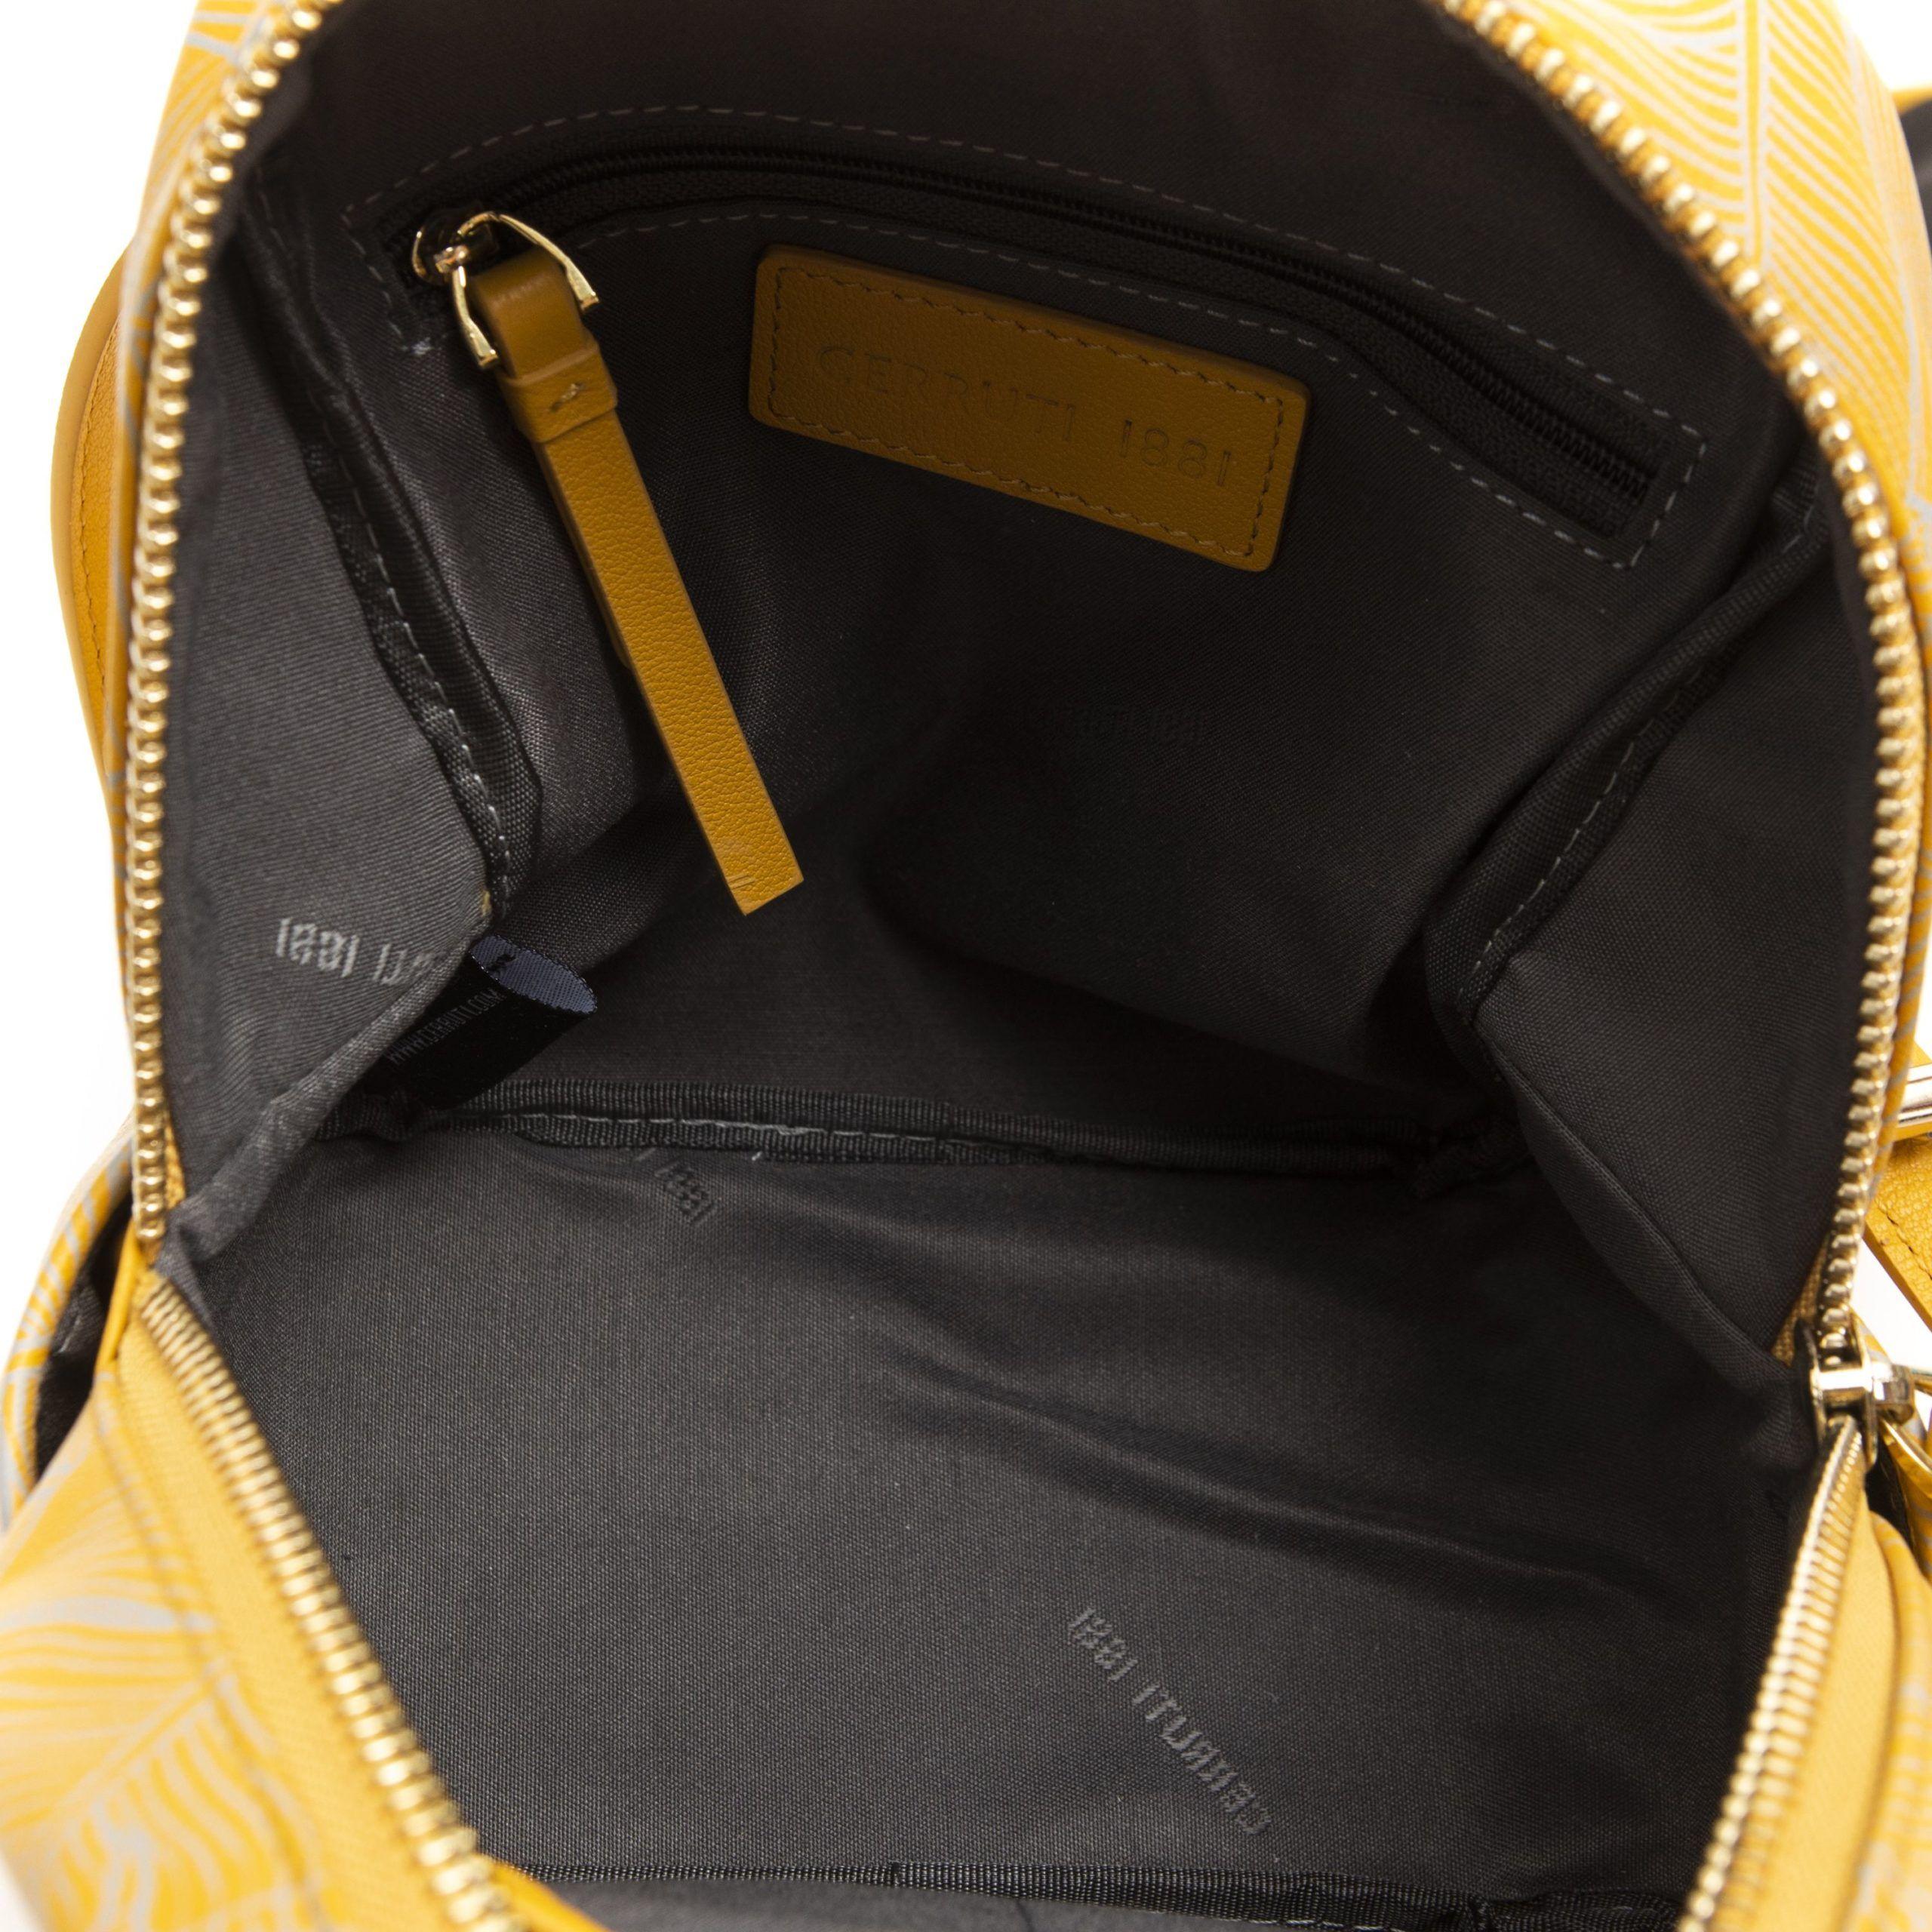 Cerruti 1881 Giallo Yellow Backpack